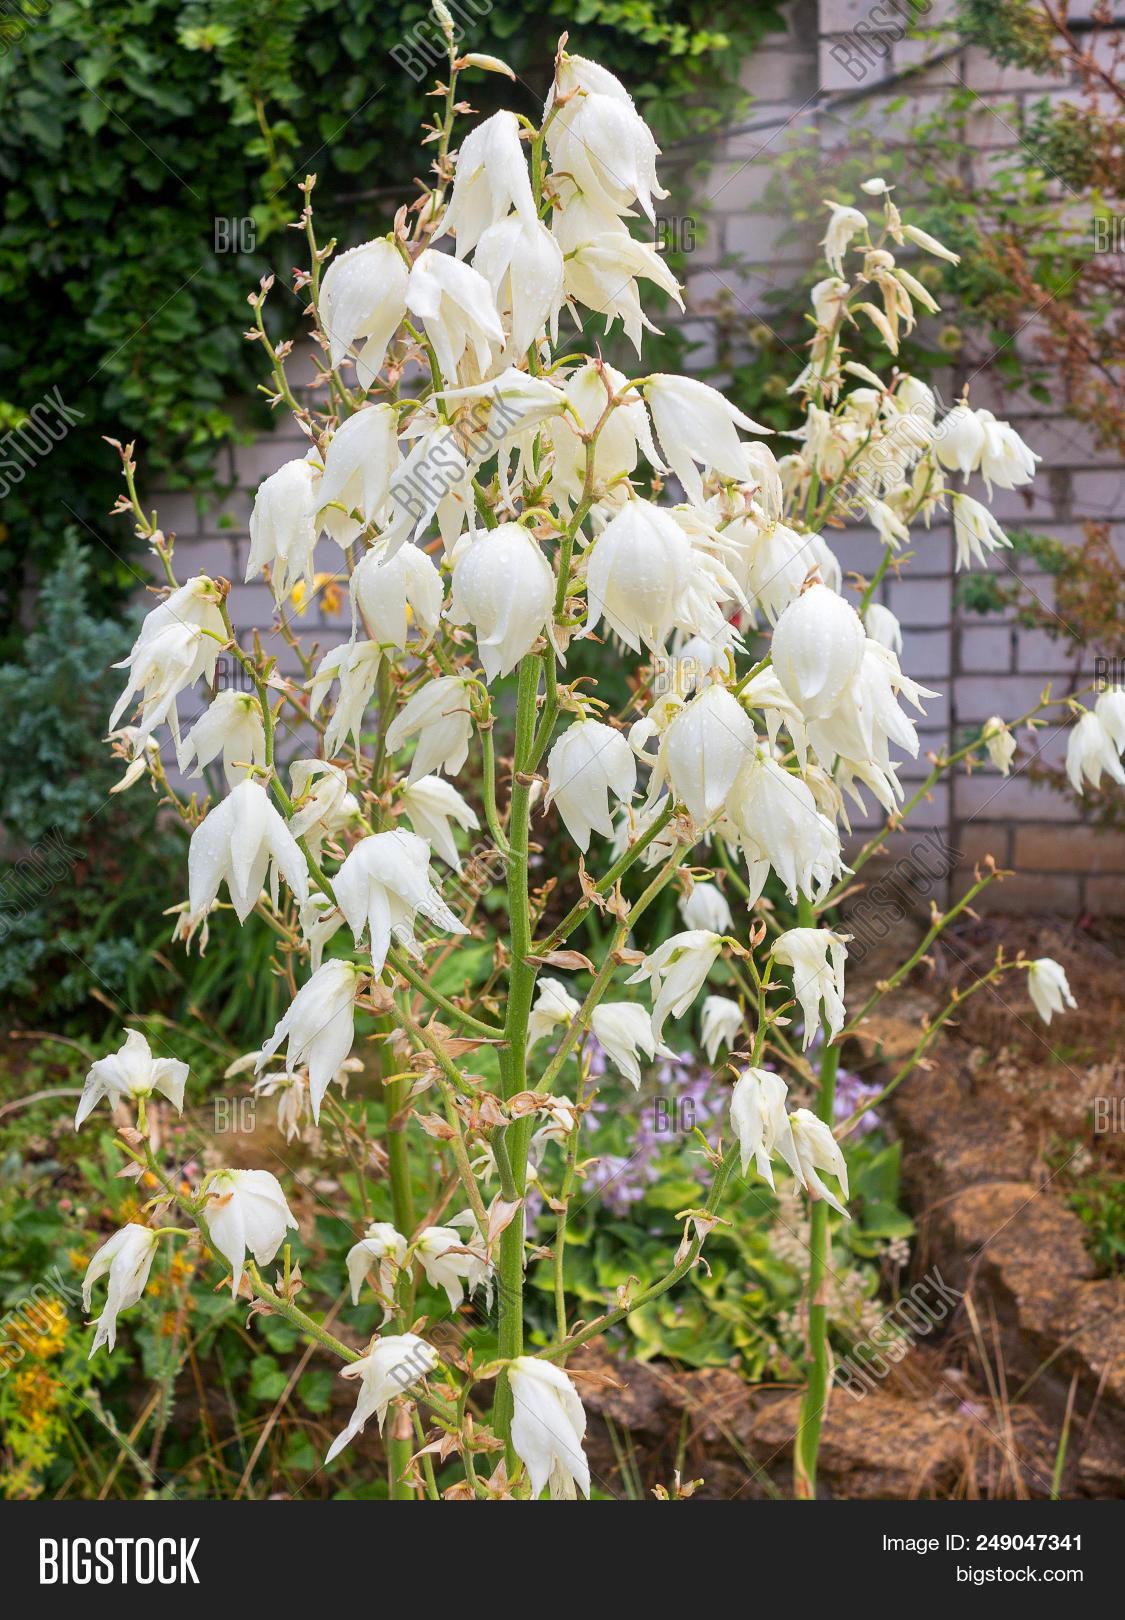 White flowers yucca image photo free trial bigstock white flowers of yucca plant mightylinksfo